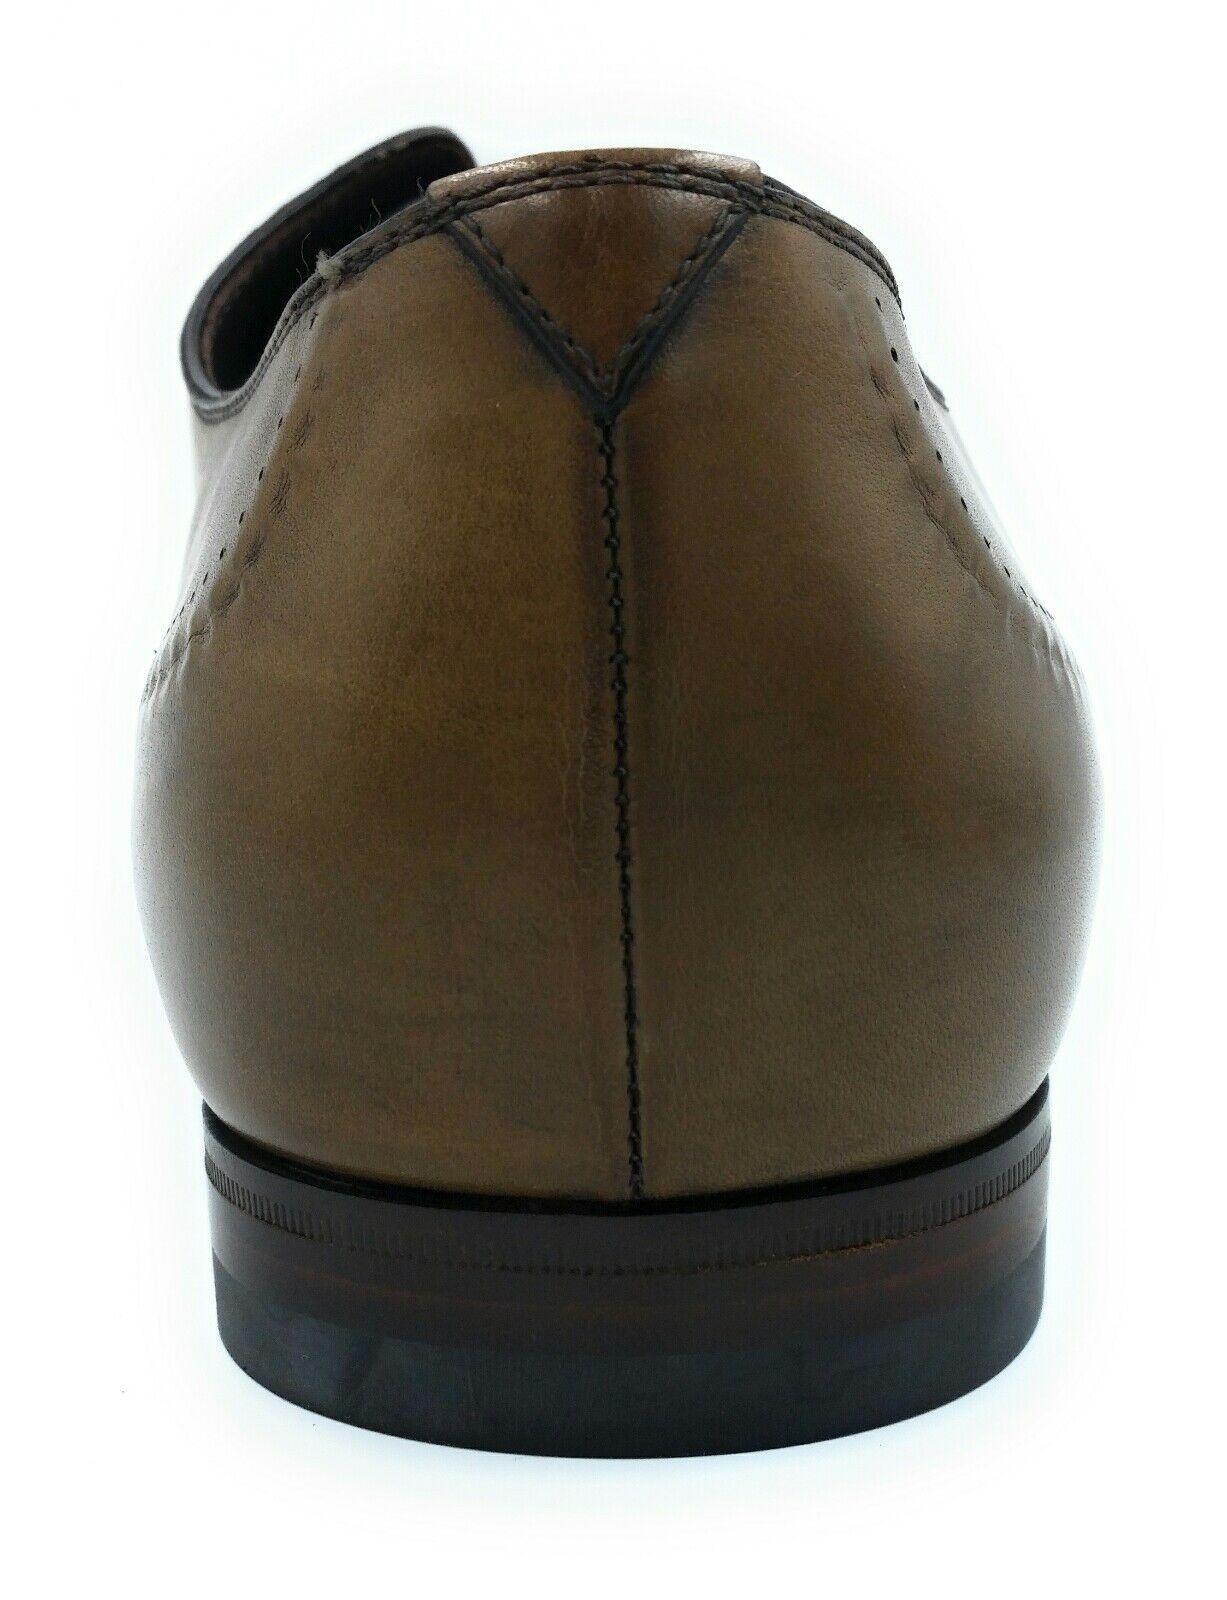 Bottega Veneta Scarpa Pelle S. Cuoio Artigiano Artigiano Artigiano Calf schuhe 51714e